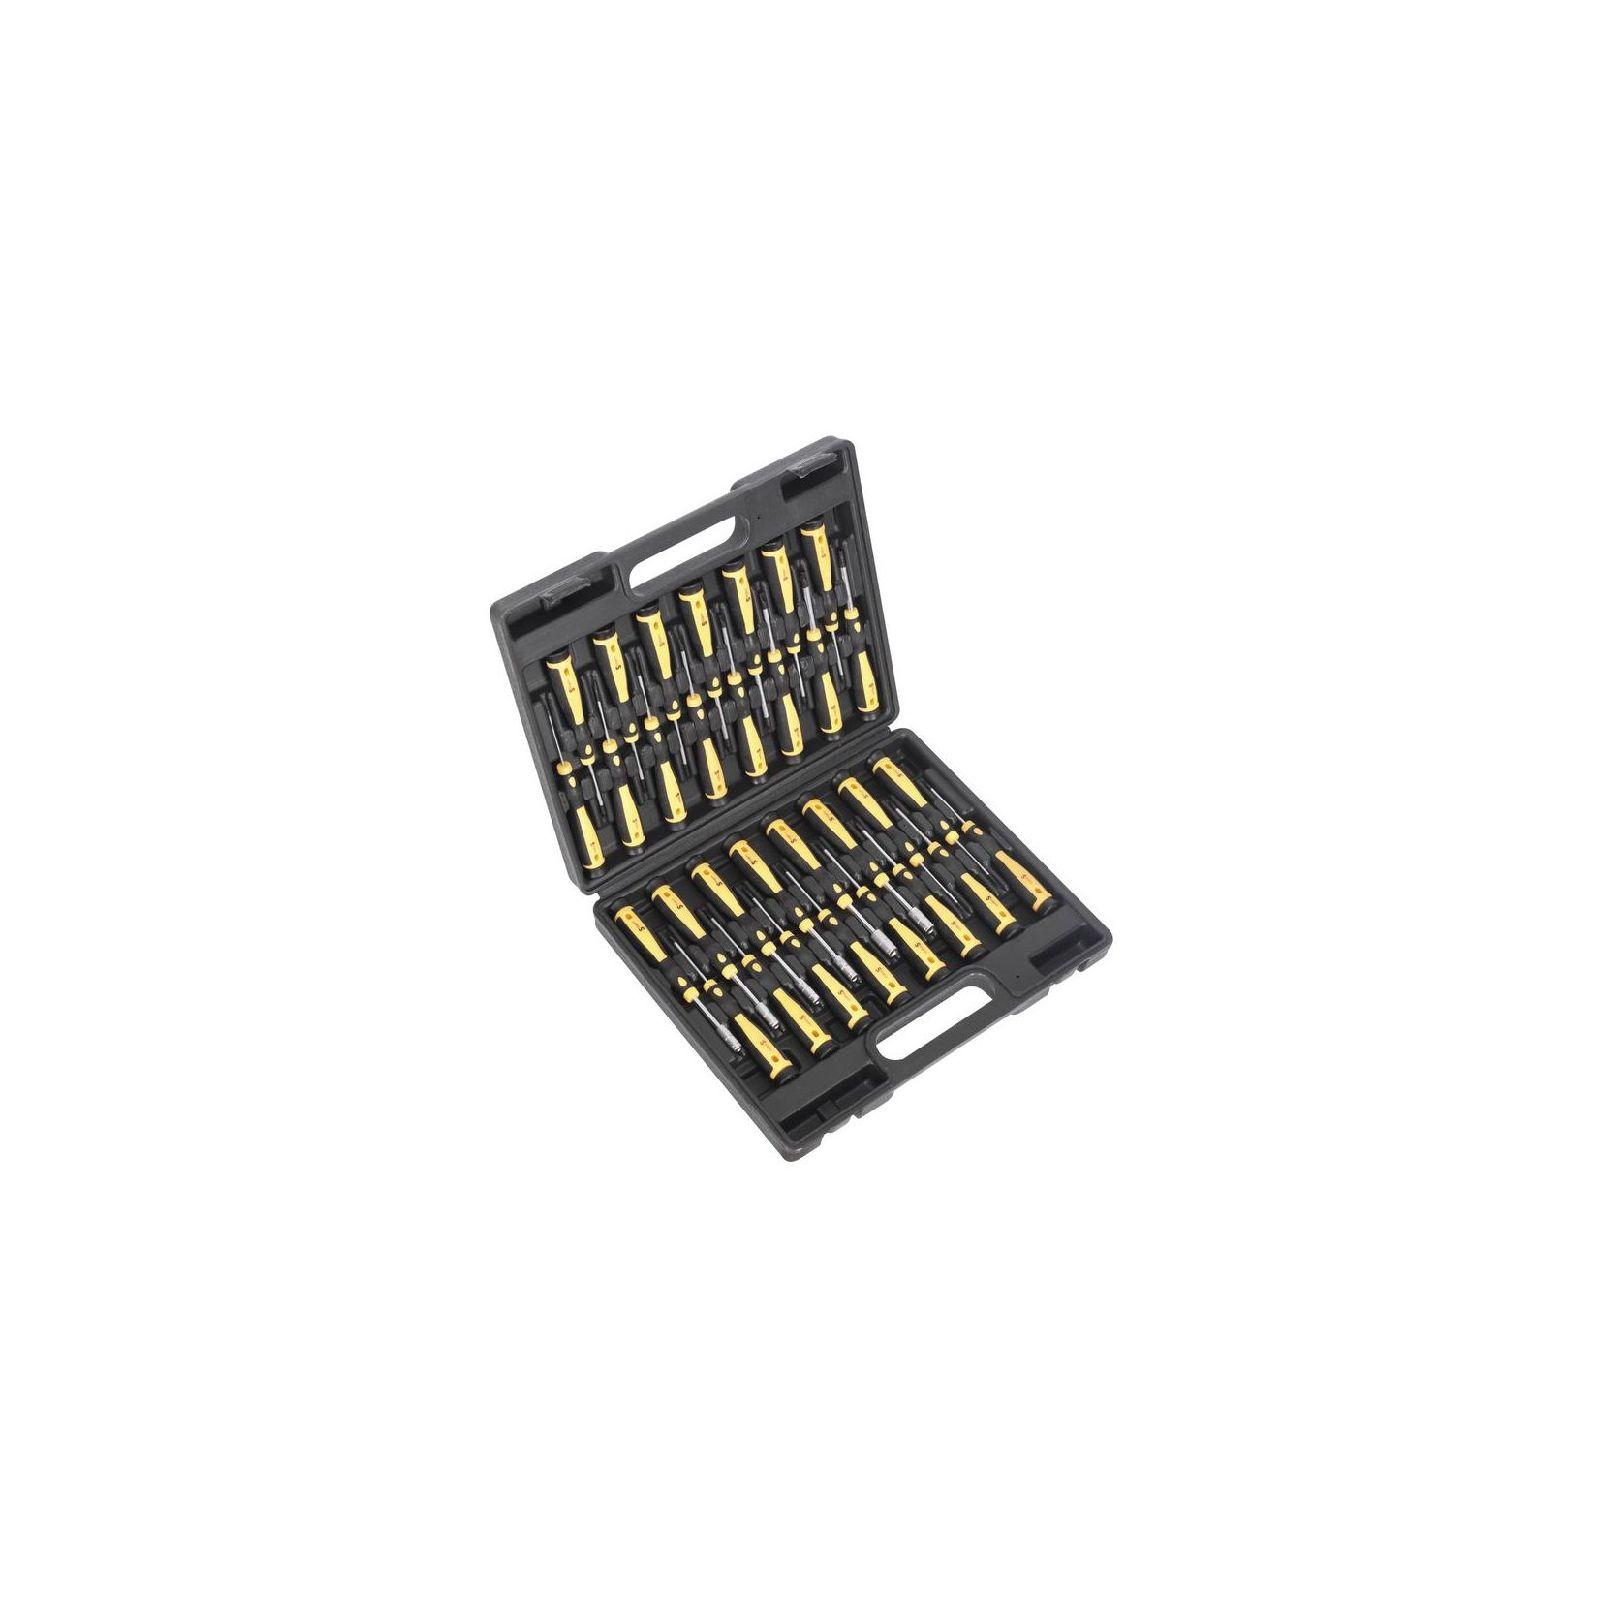 siegen precision screwdriver set 31 piece screwdriver set work tools s0899. Black Bedroom Furniture Sets. Home Design Ideas